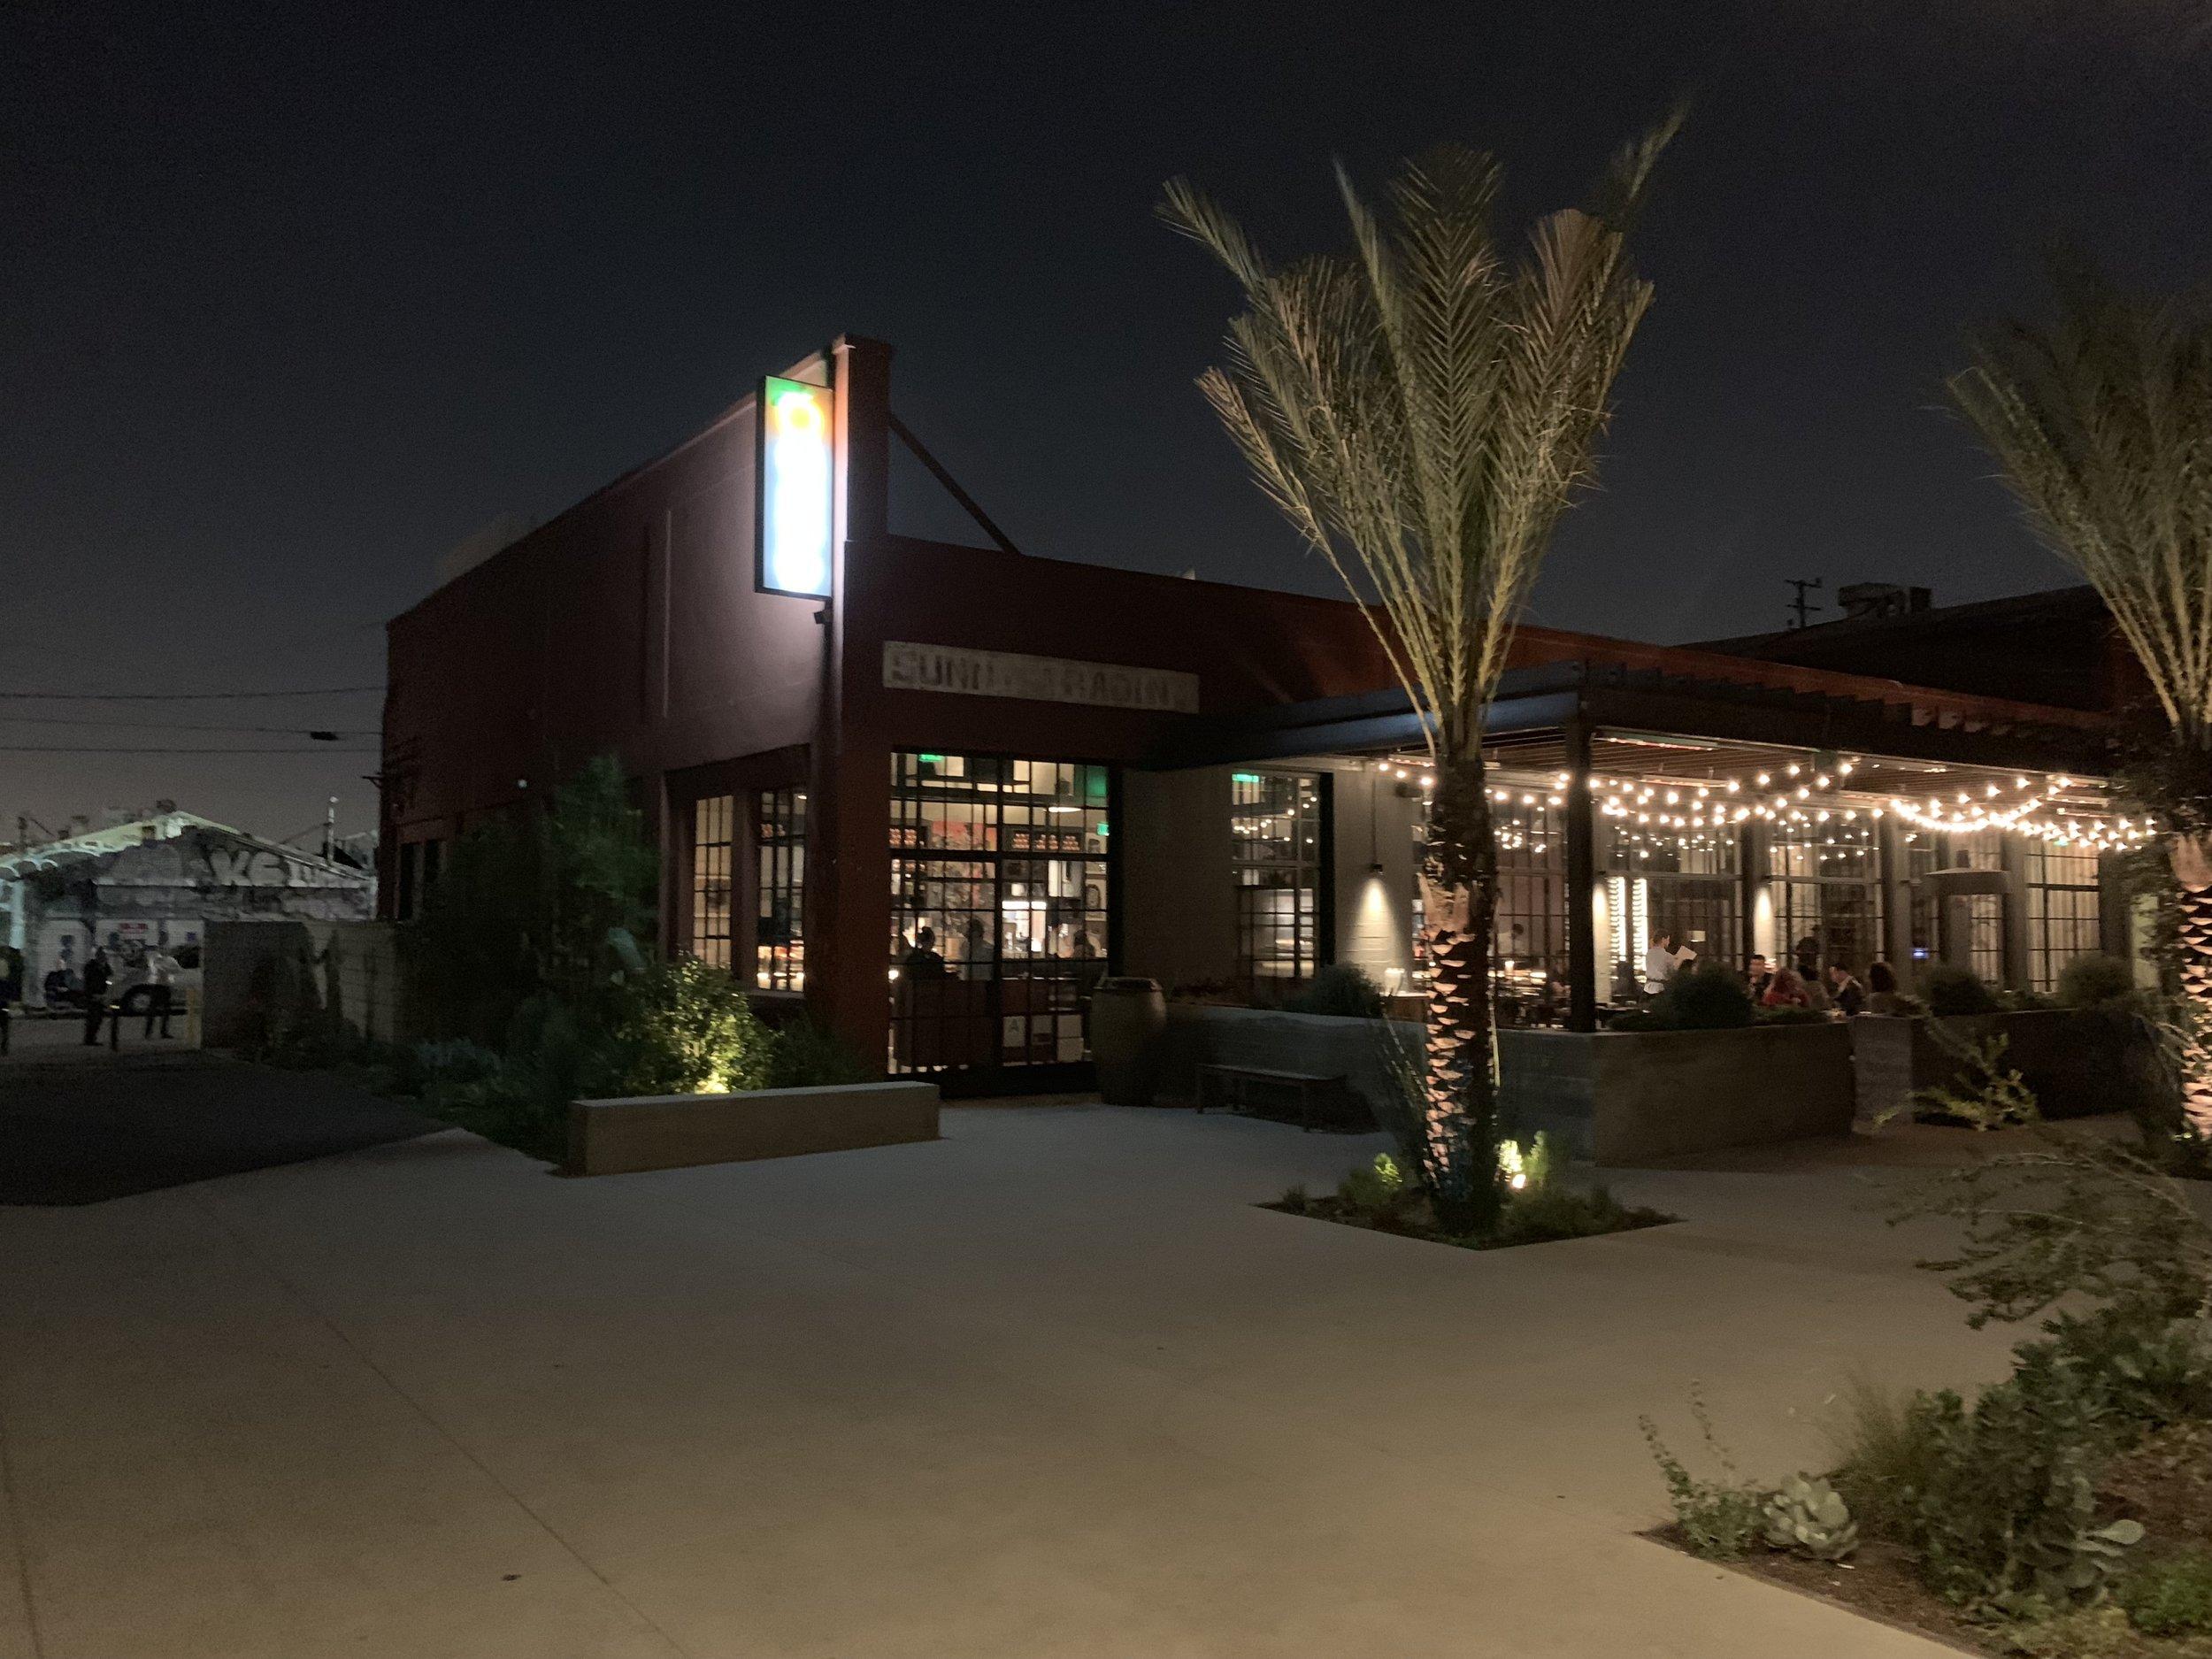 Mojodōmo by night